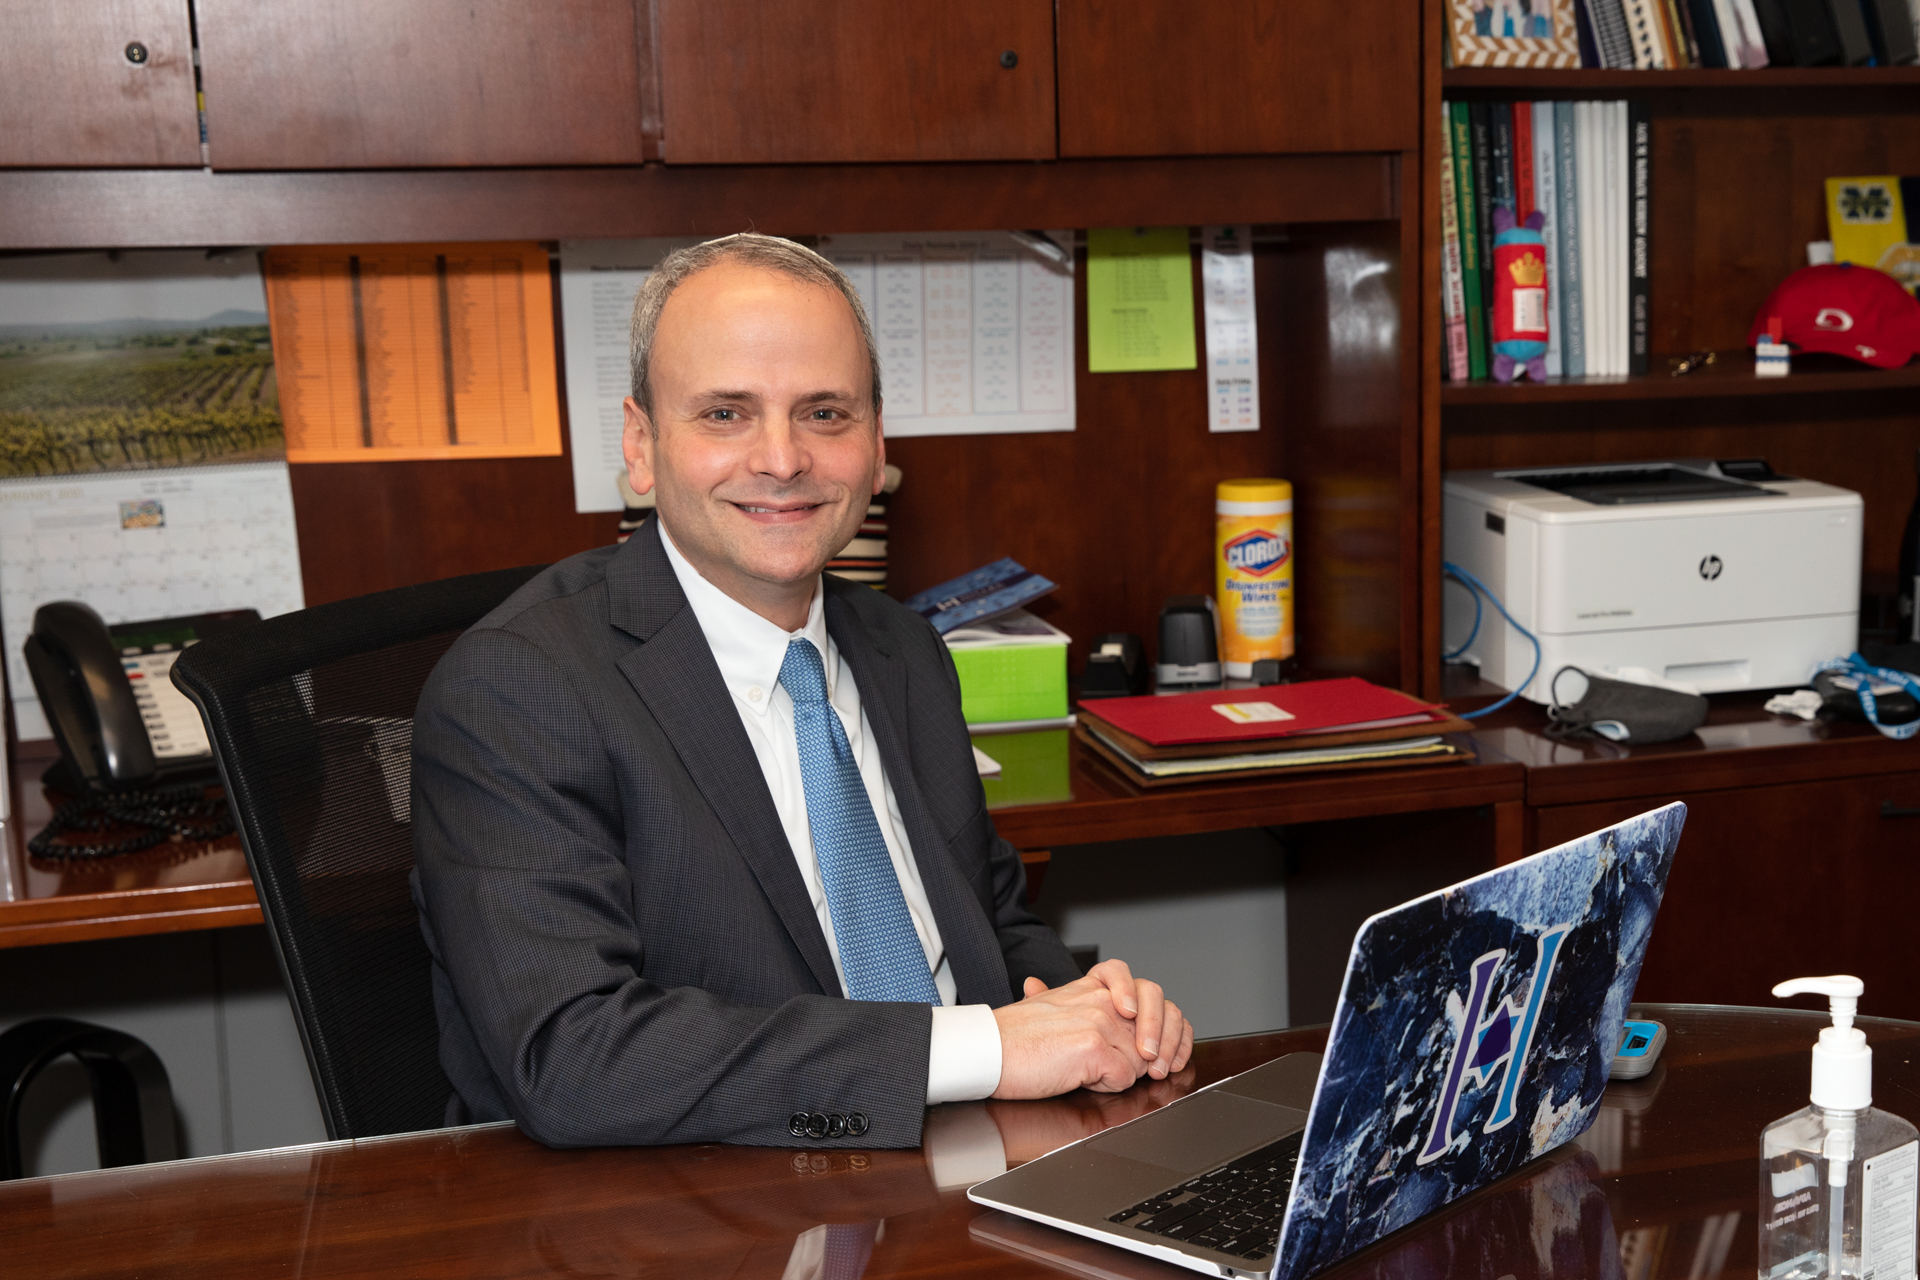 Dr. Darin Katz